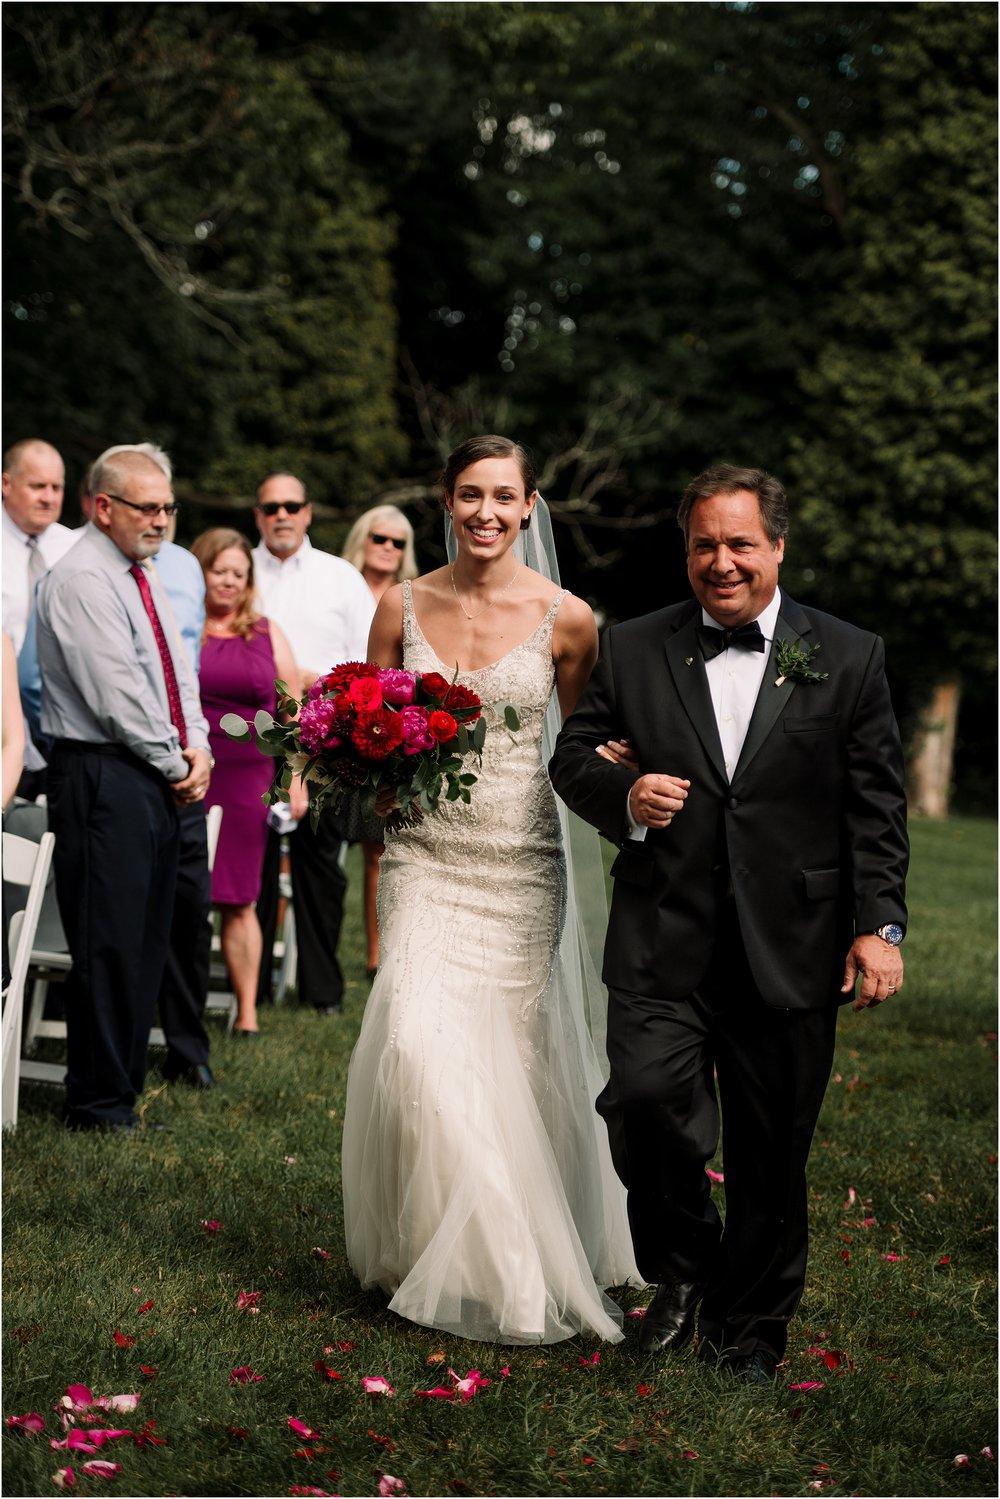 hannah leigh photography Antrim 1844 Wedding_1209.jpg